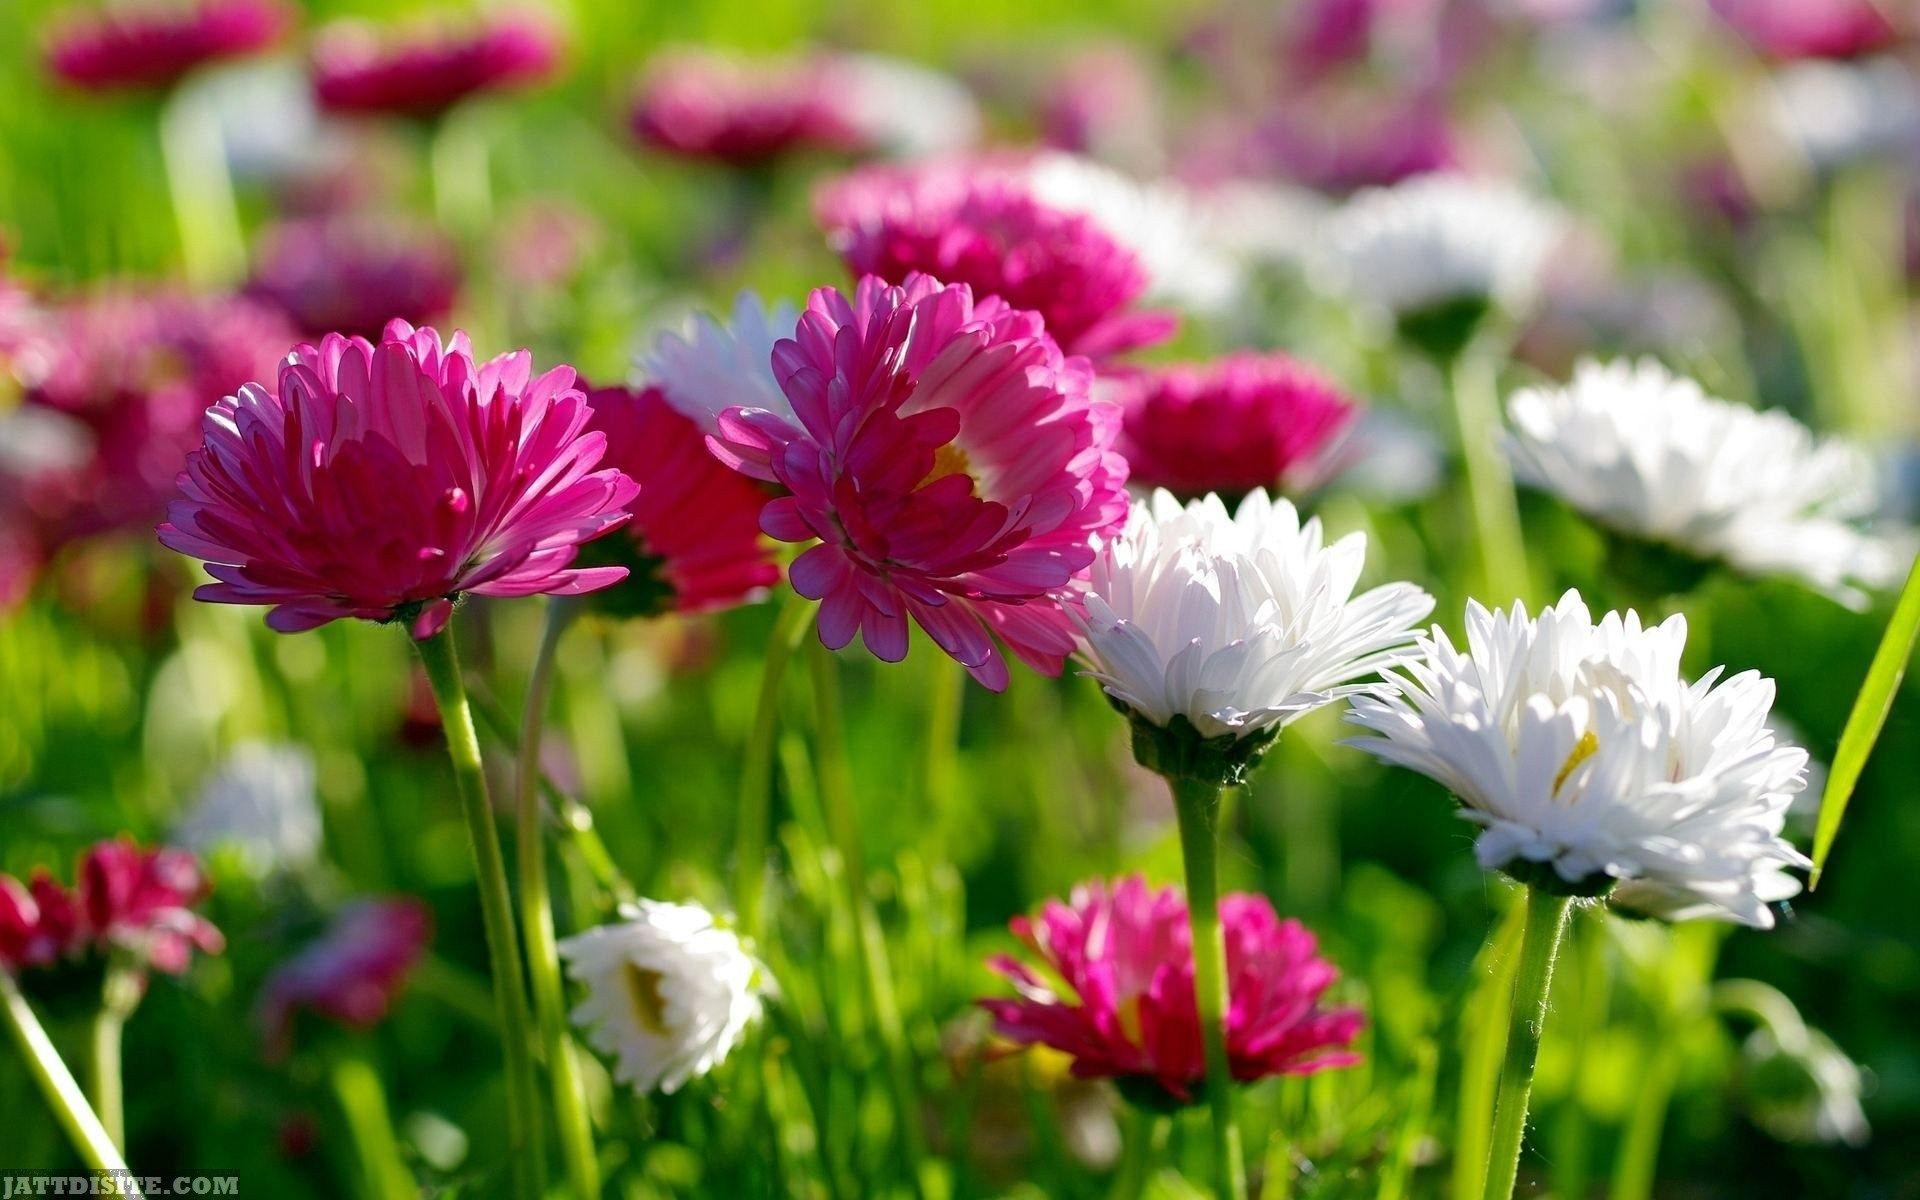 Beautiful Flowers Wallpapers Gzsihai - Beautiful Flowers Hd Wallpapers Download , HD Wallpaper & Backgrounds